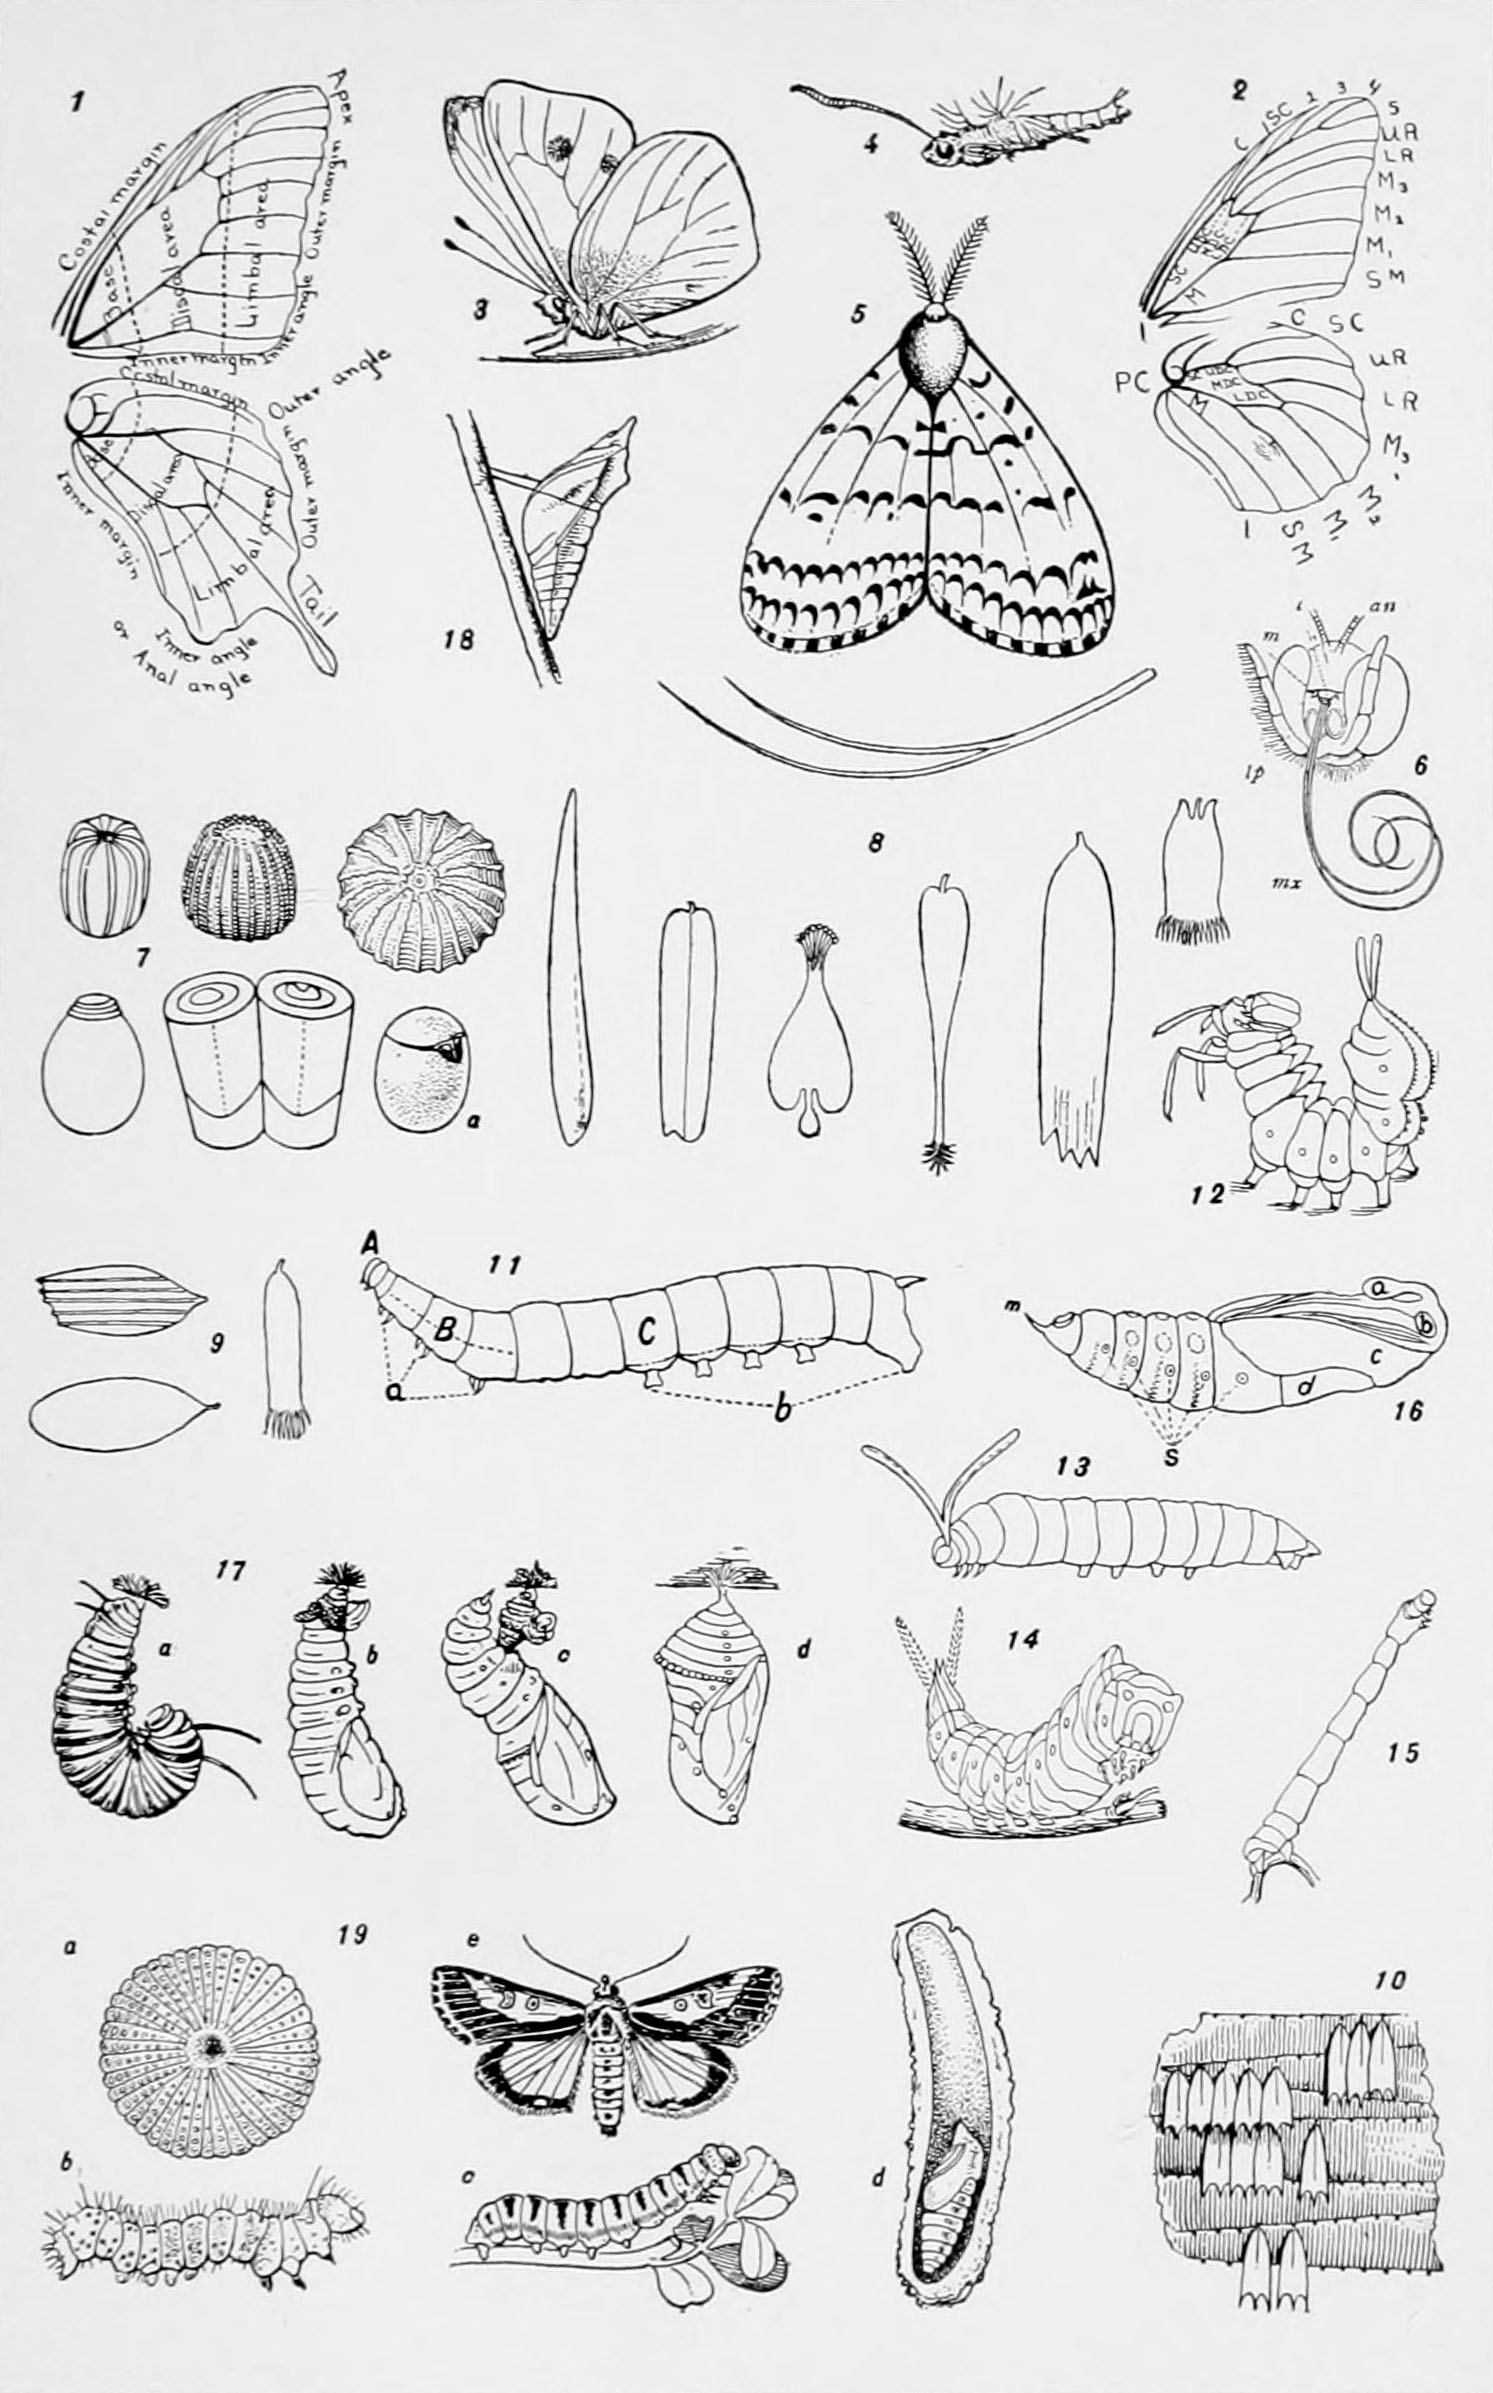 butterfly anatomy diagram vw beetle wiring 1968 file nie 1905 butterflies and moths jpg wikimedia commons